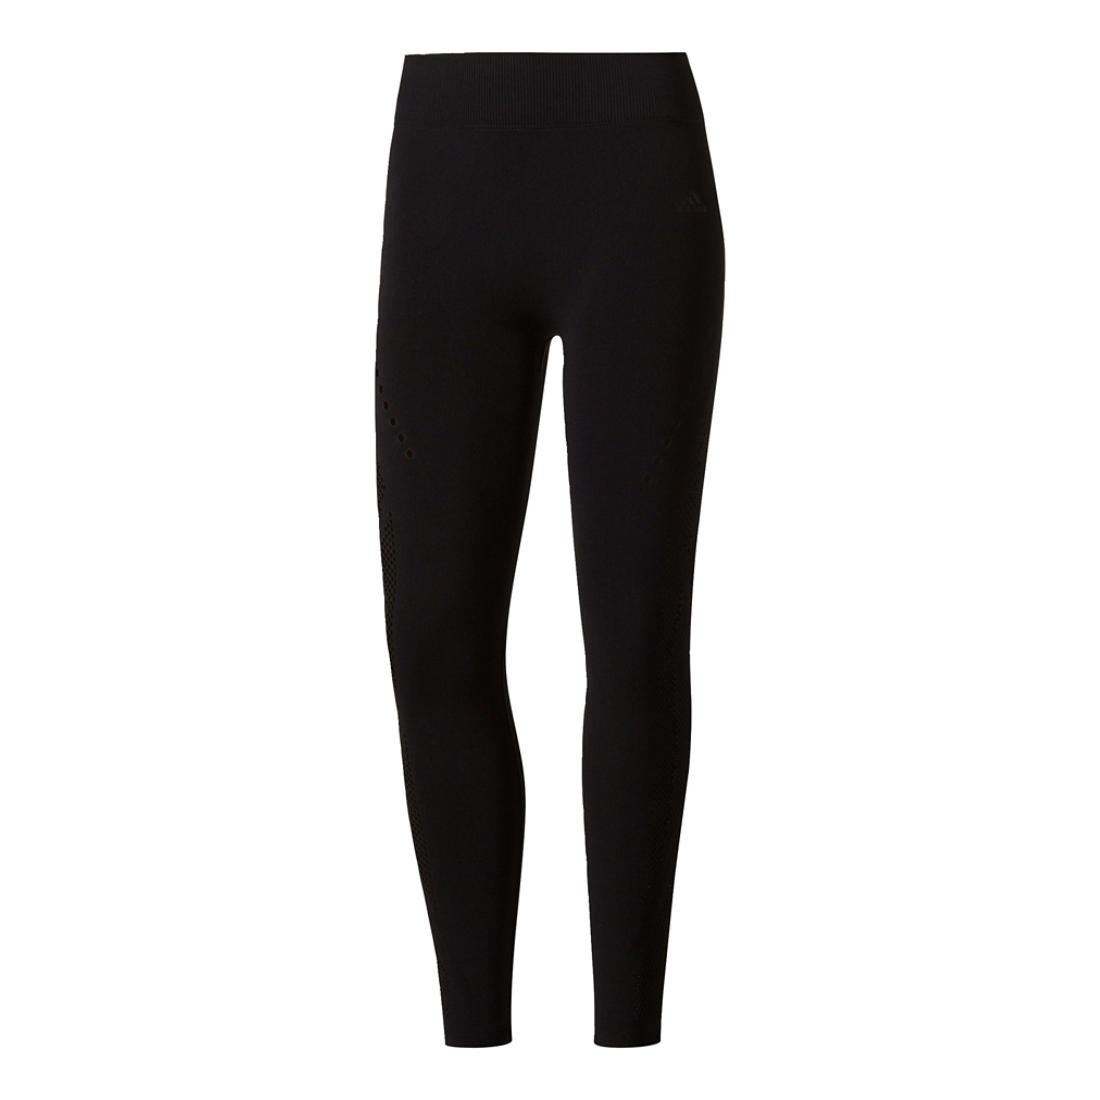 852ac3374e072 Amazon.com: adidas Womens Fitness Yoga Athletic Leggings: Clothing